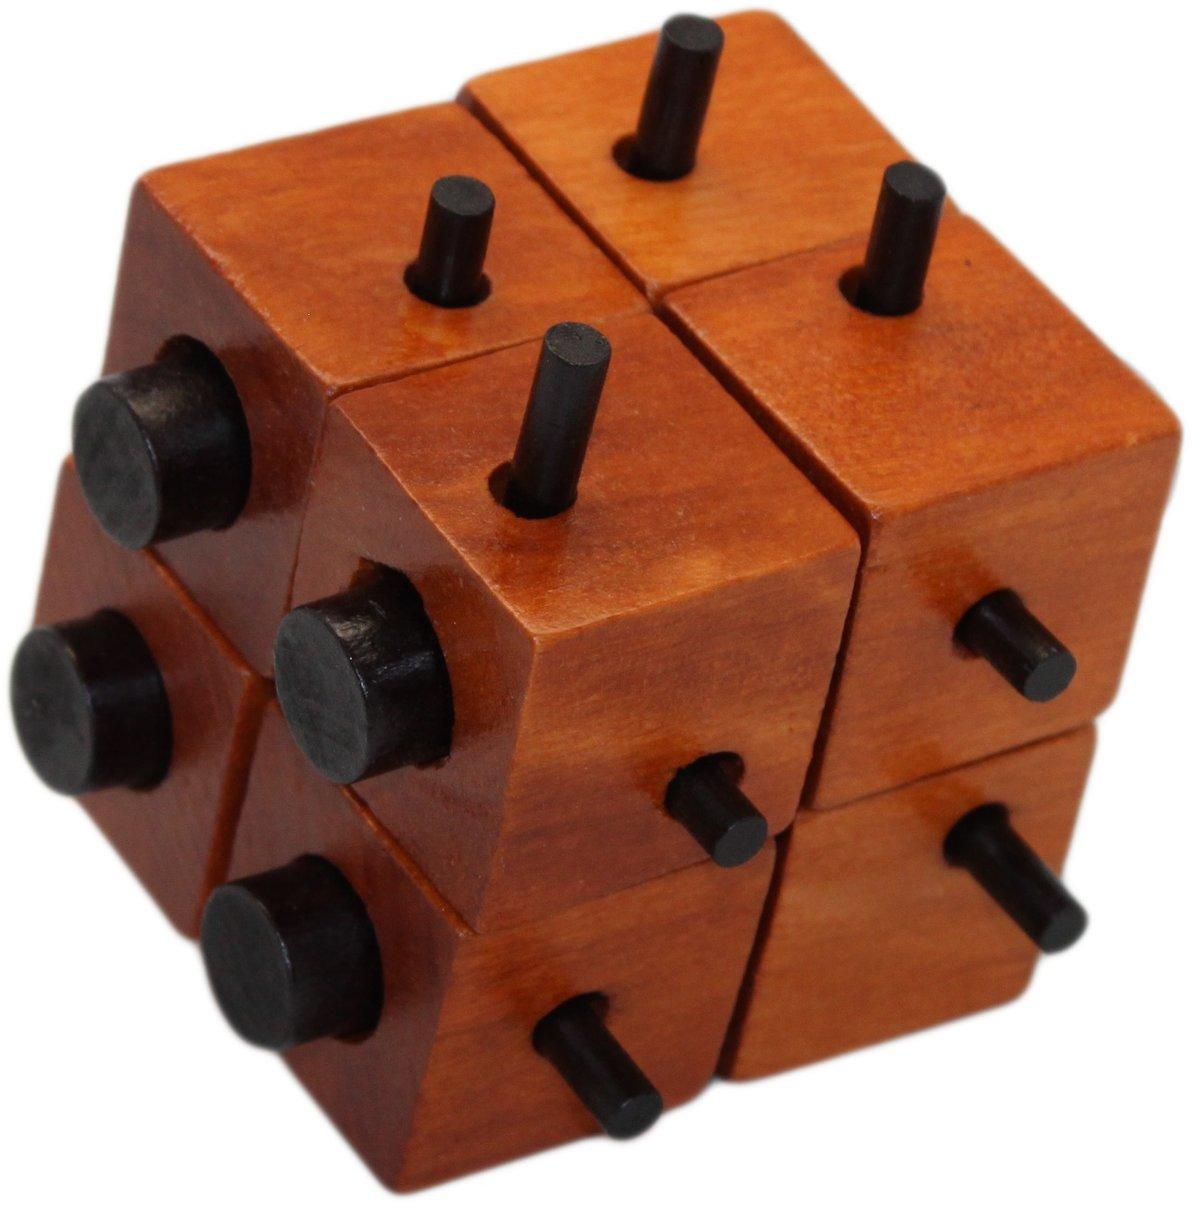 3д головоломки своими руками